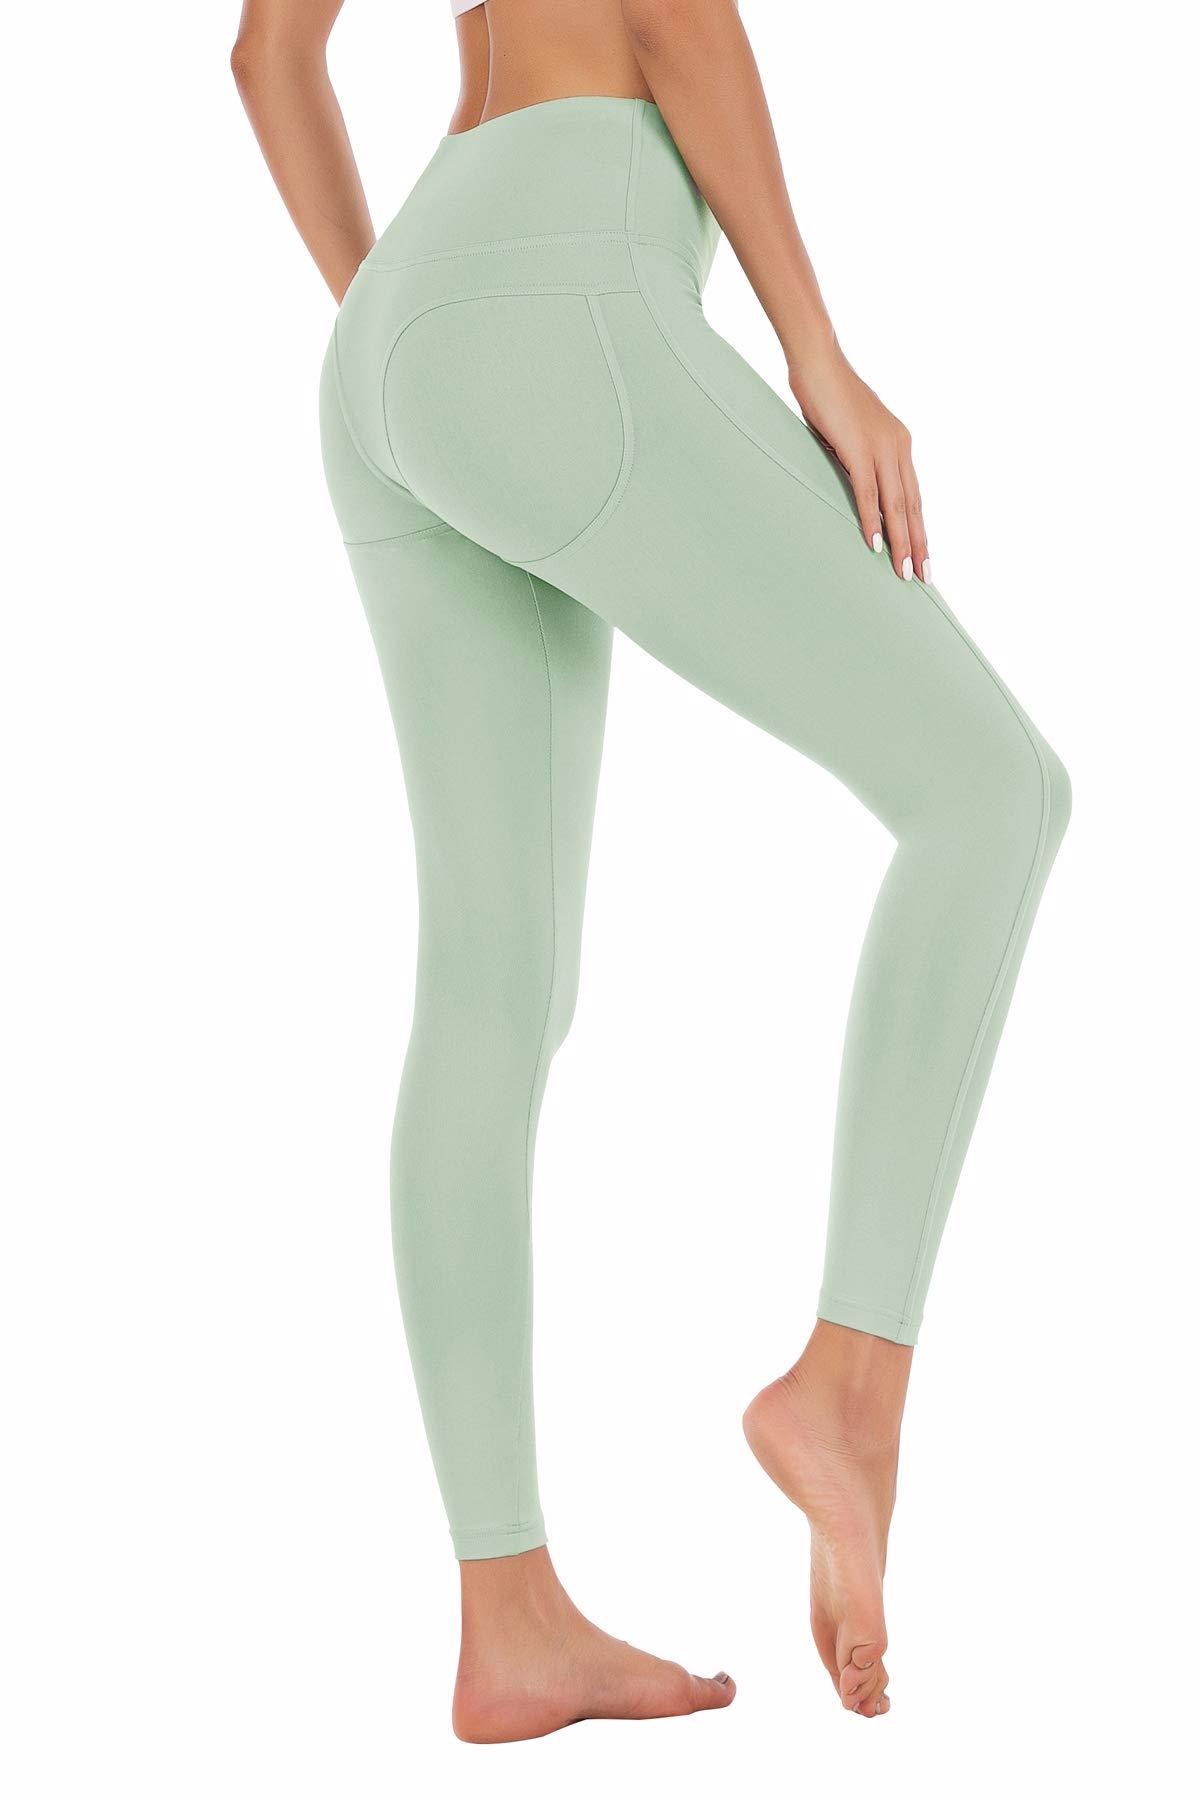 Women Butt Lift Yoga Pants Slimming High Waist Tummy Control Dry-Fit Workout Gym Leggings